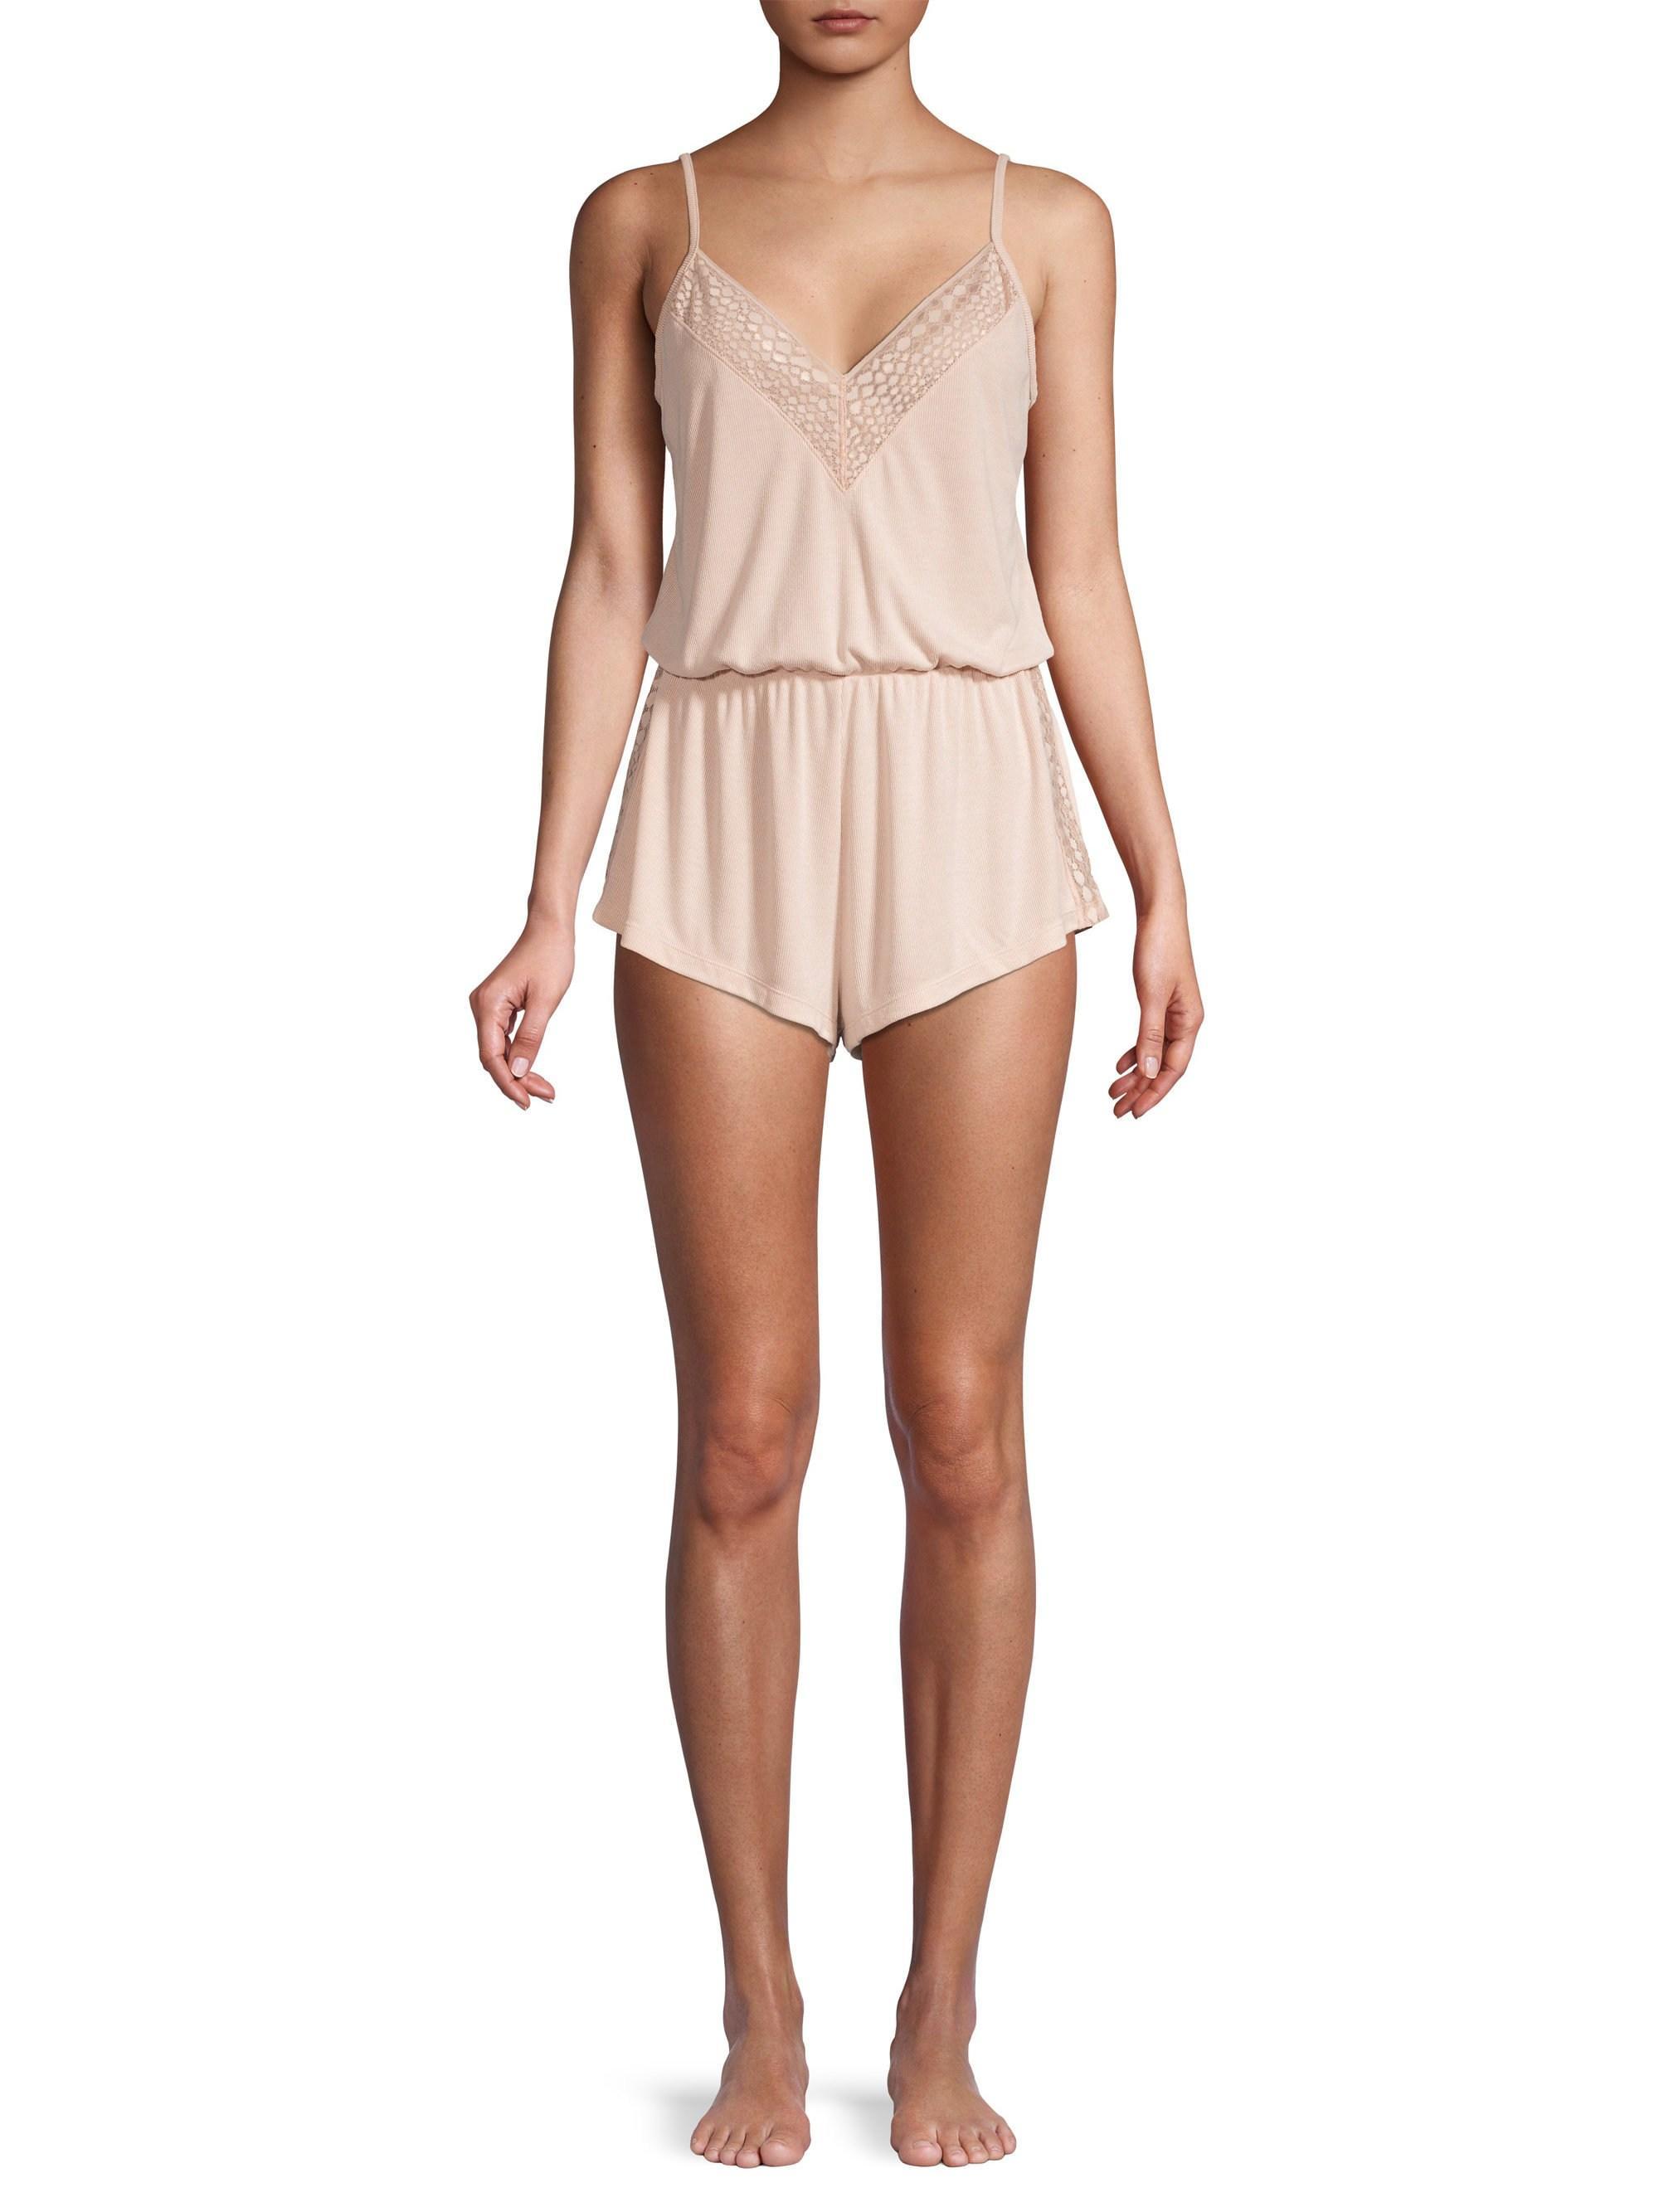 9c7f246ac1d8 Cosabella - Women s Sweet Dreams Lace-trim Sleep Romper - Pink Dust Snake -  Size. View fullscreen